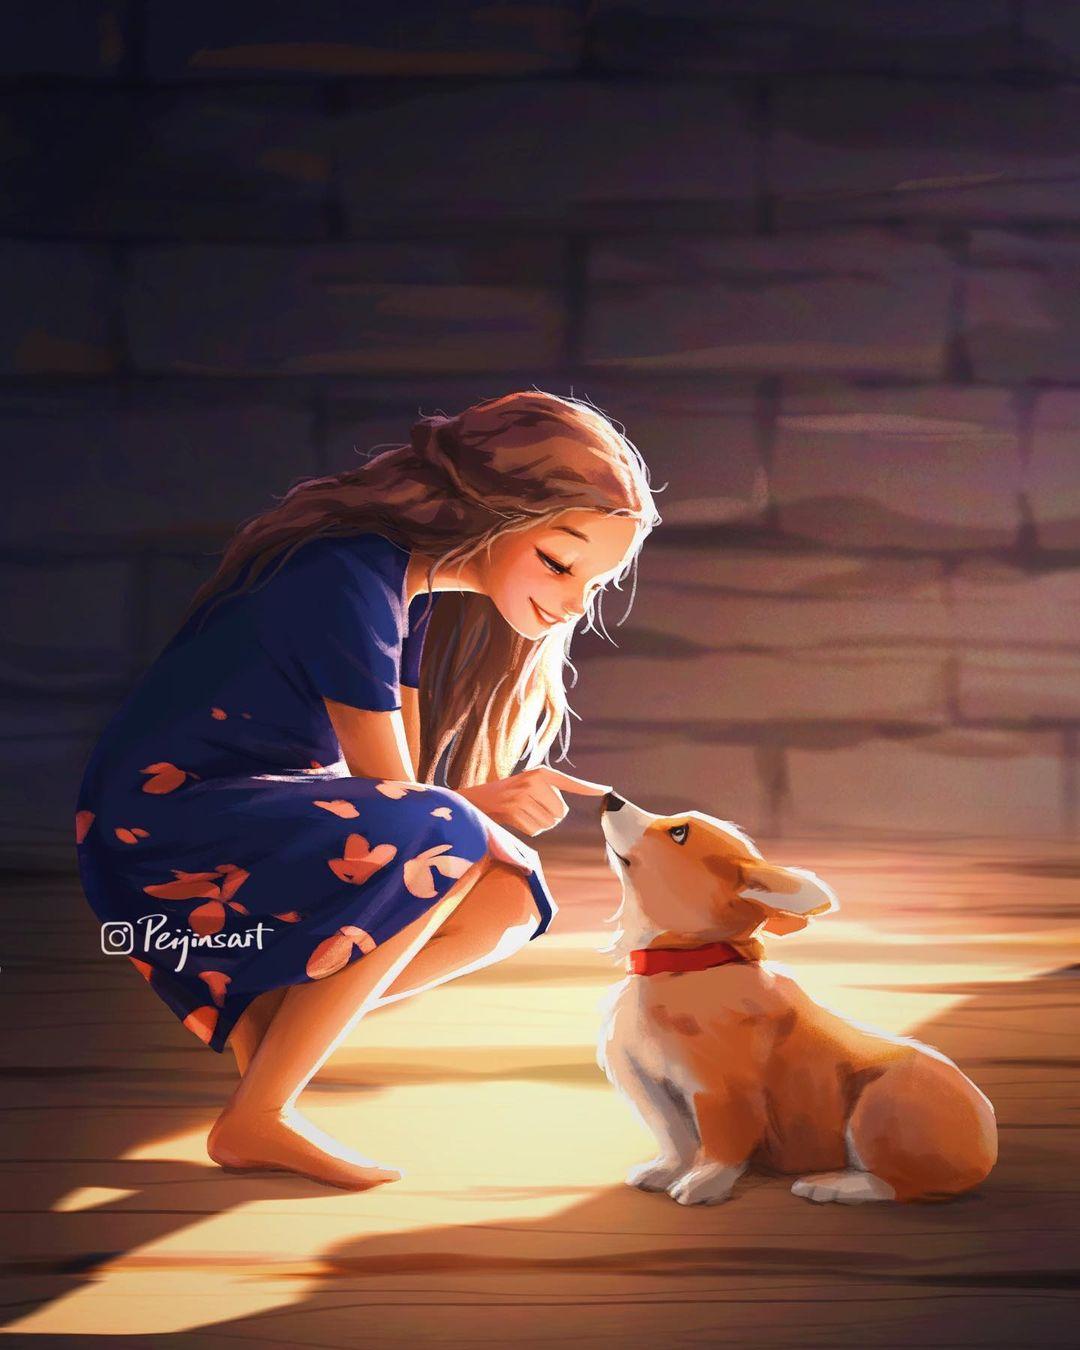 Animal and Character Illustrations by Peijin Yang